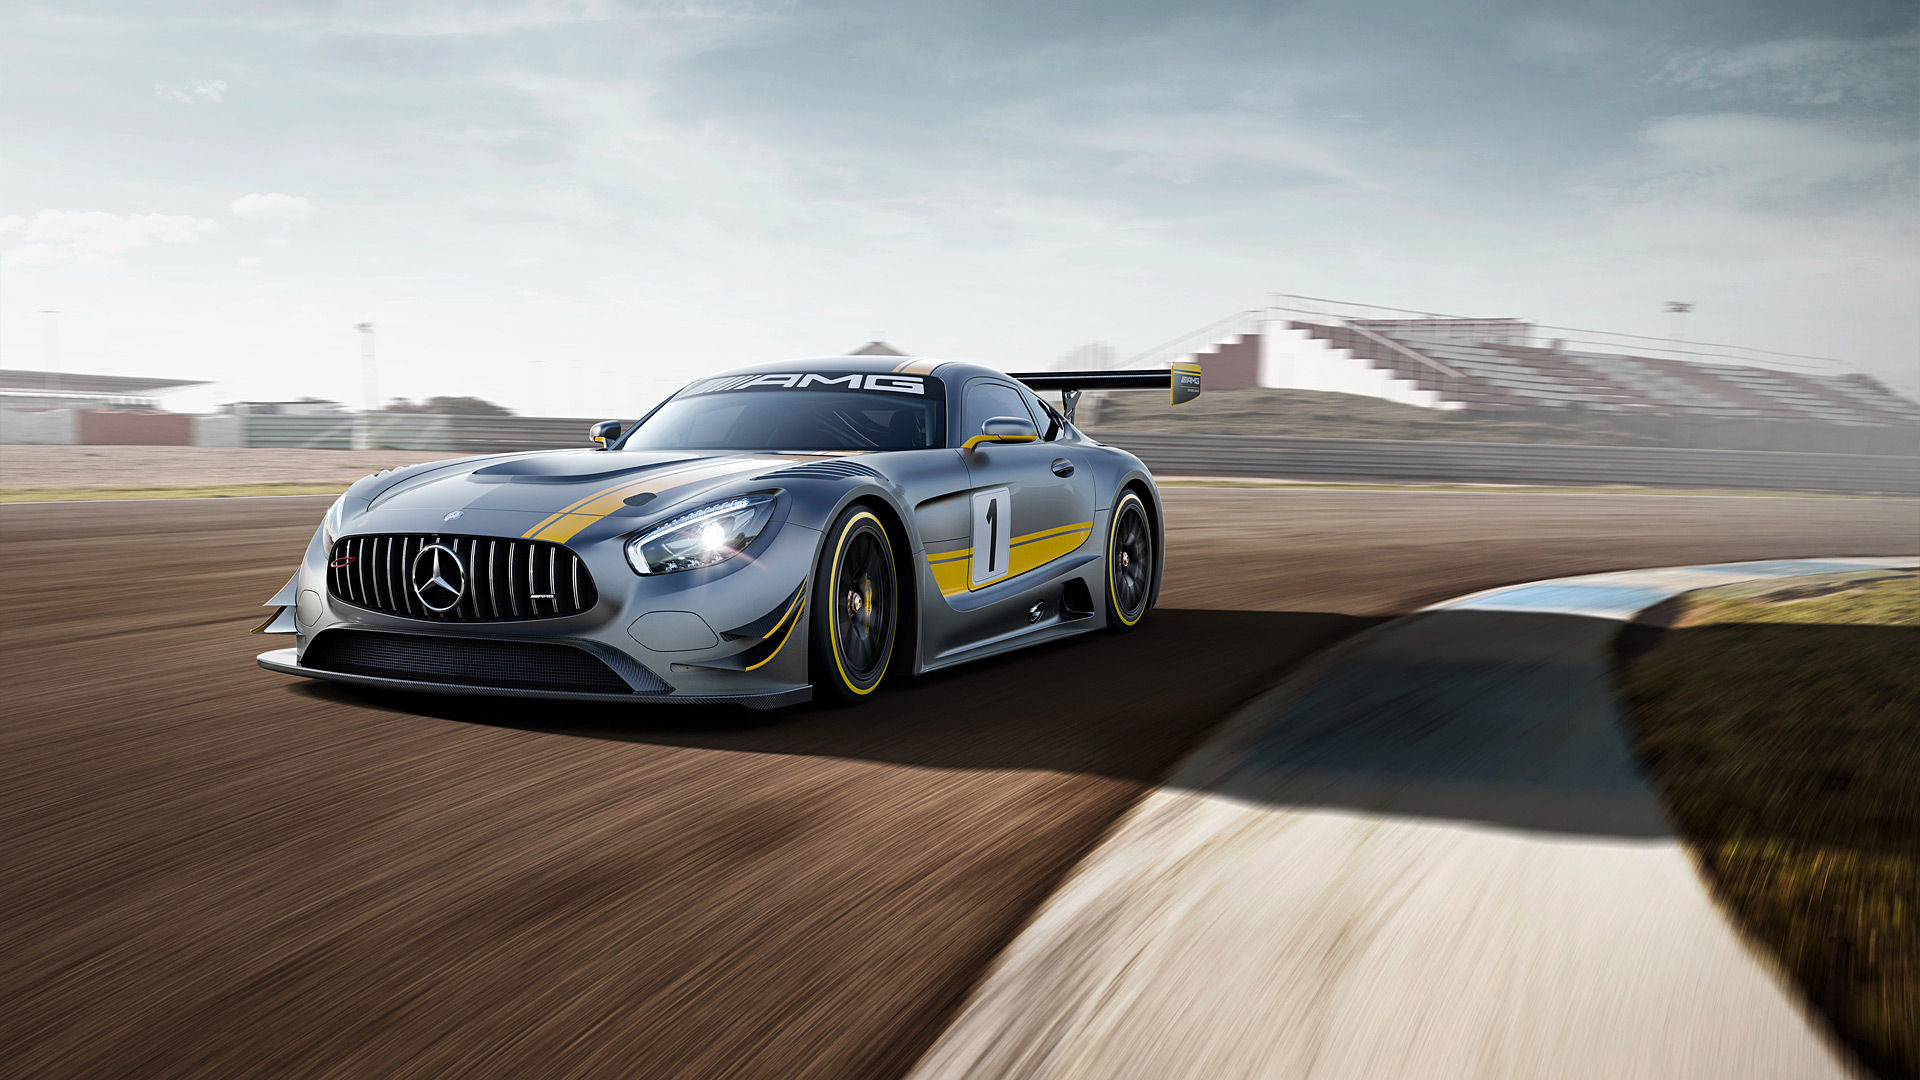 2015 Mercedes-AMG GT3